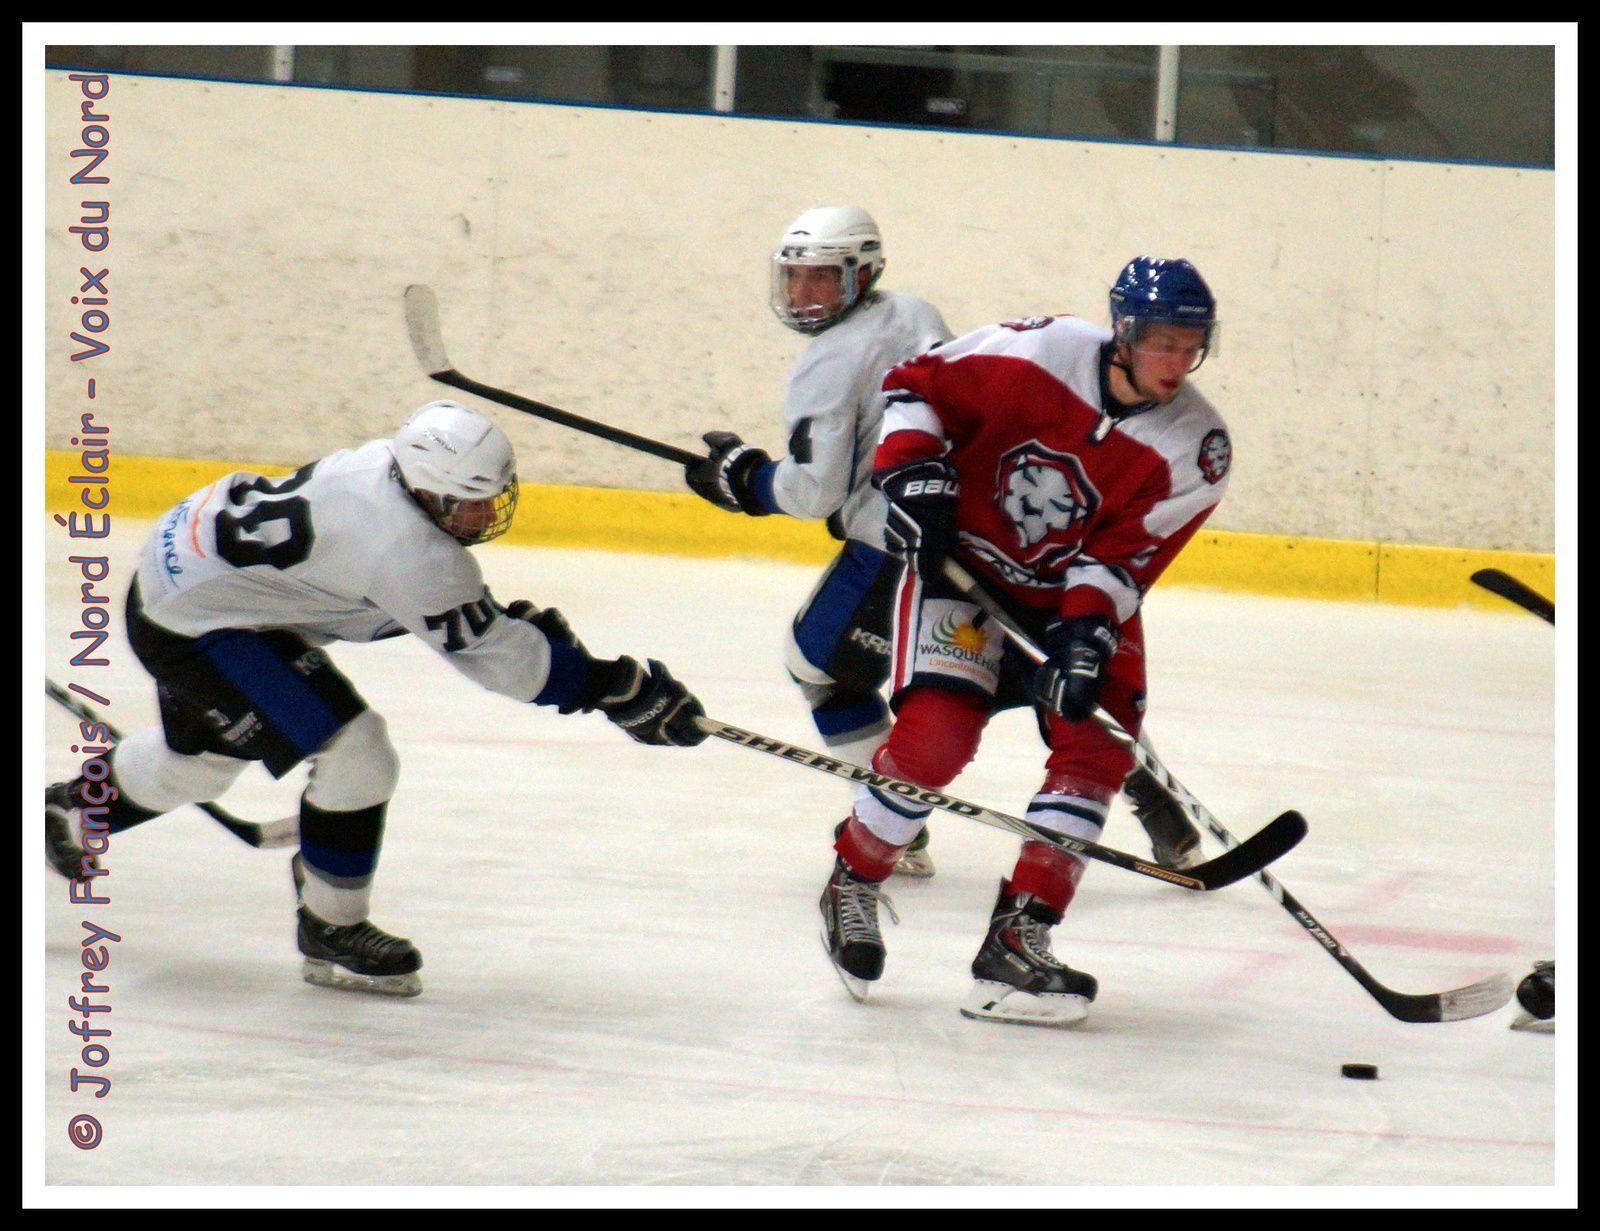 1.11.14 Hockey/glace Wasquehal - Deuil/Garges